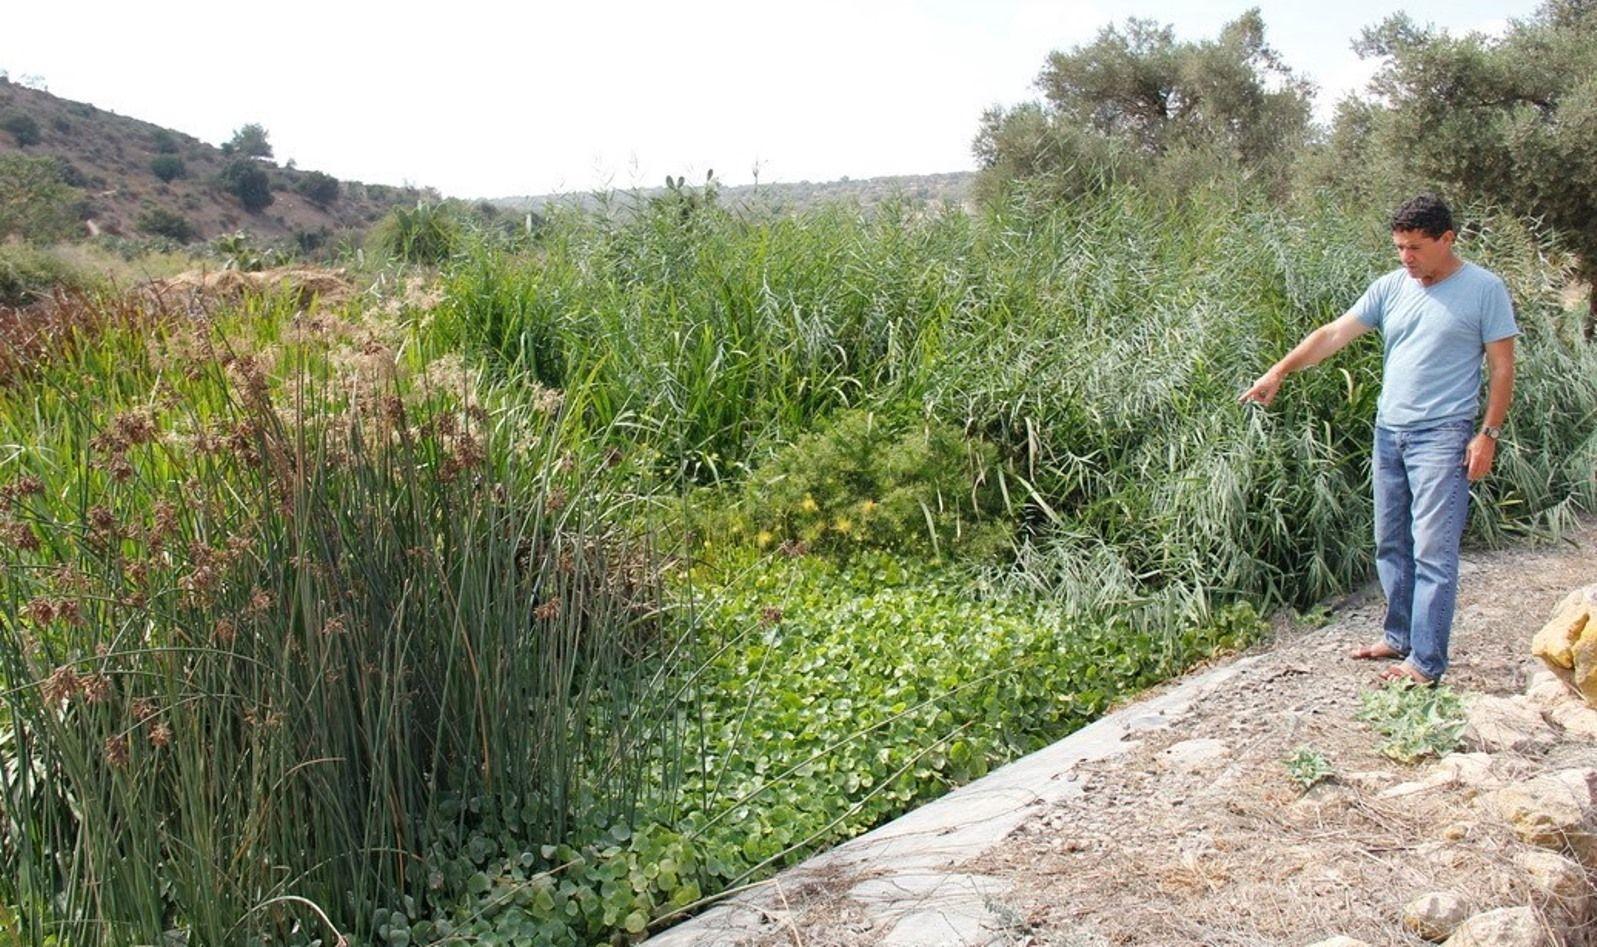 Ayala Water & Ecology CEO Eli Cohen among his plants at Moshav Tzipori. Photo: courtesy